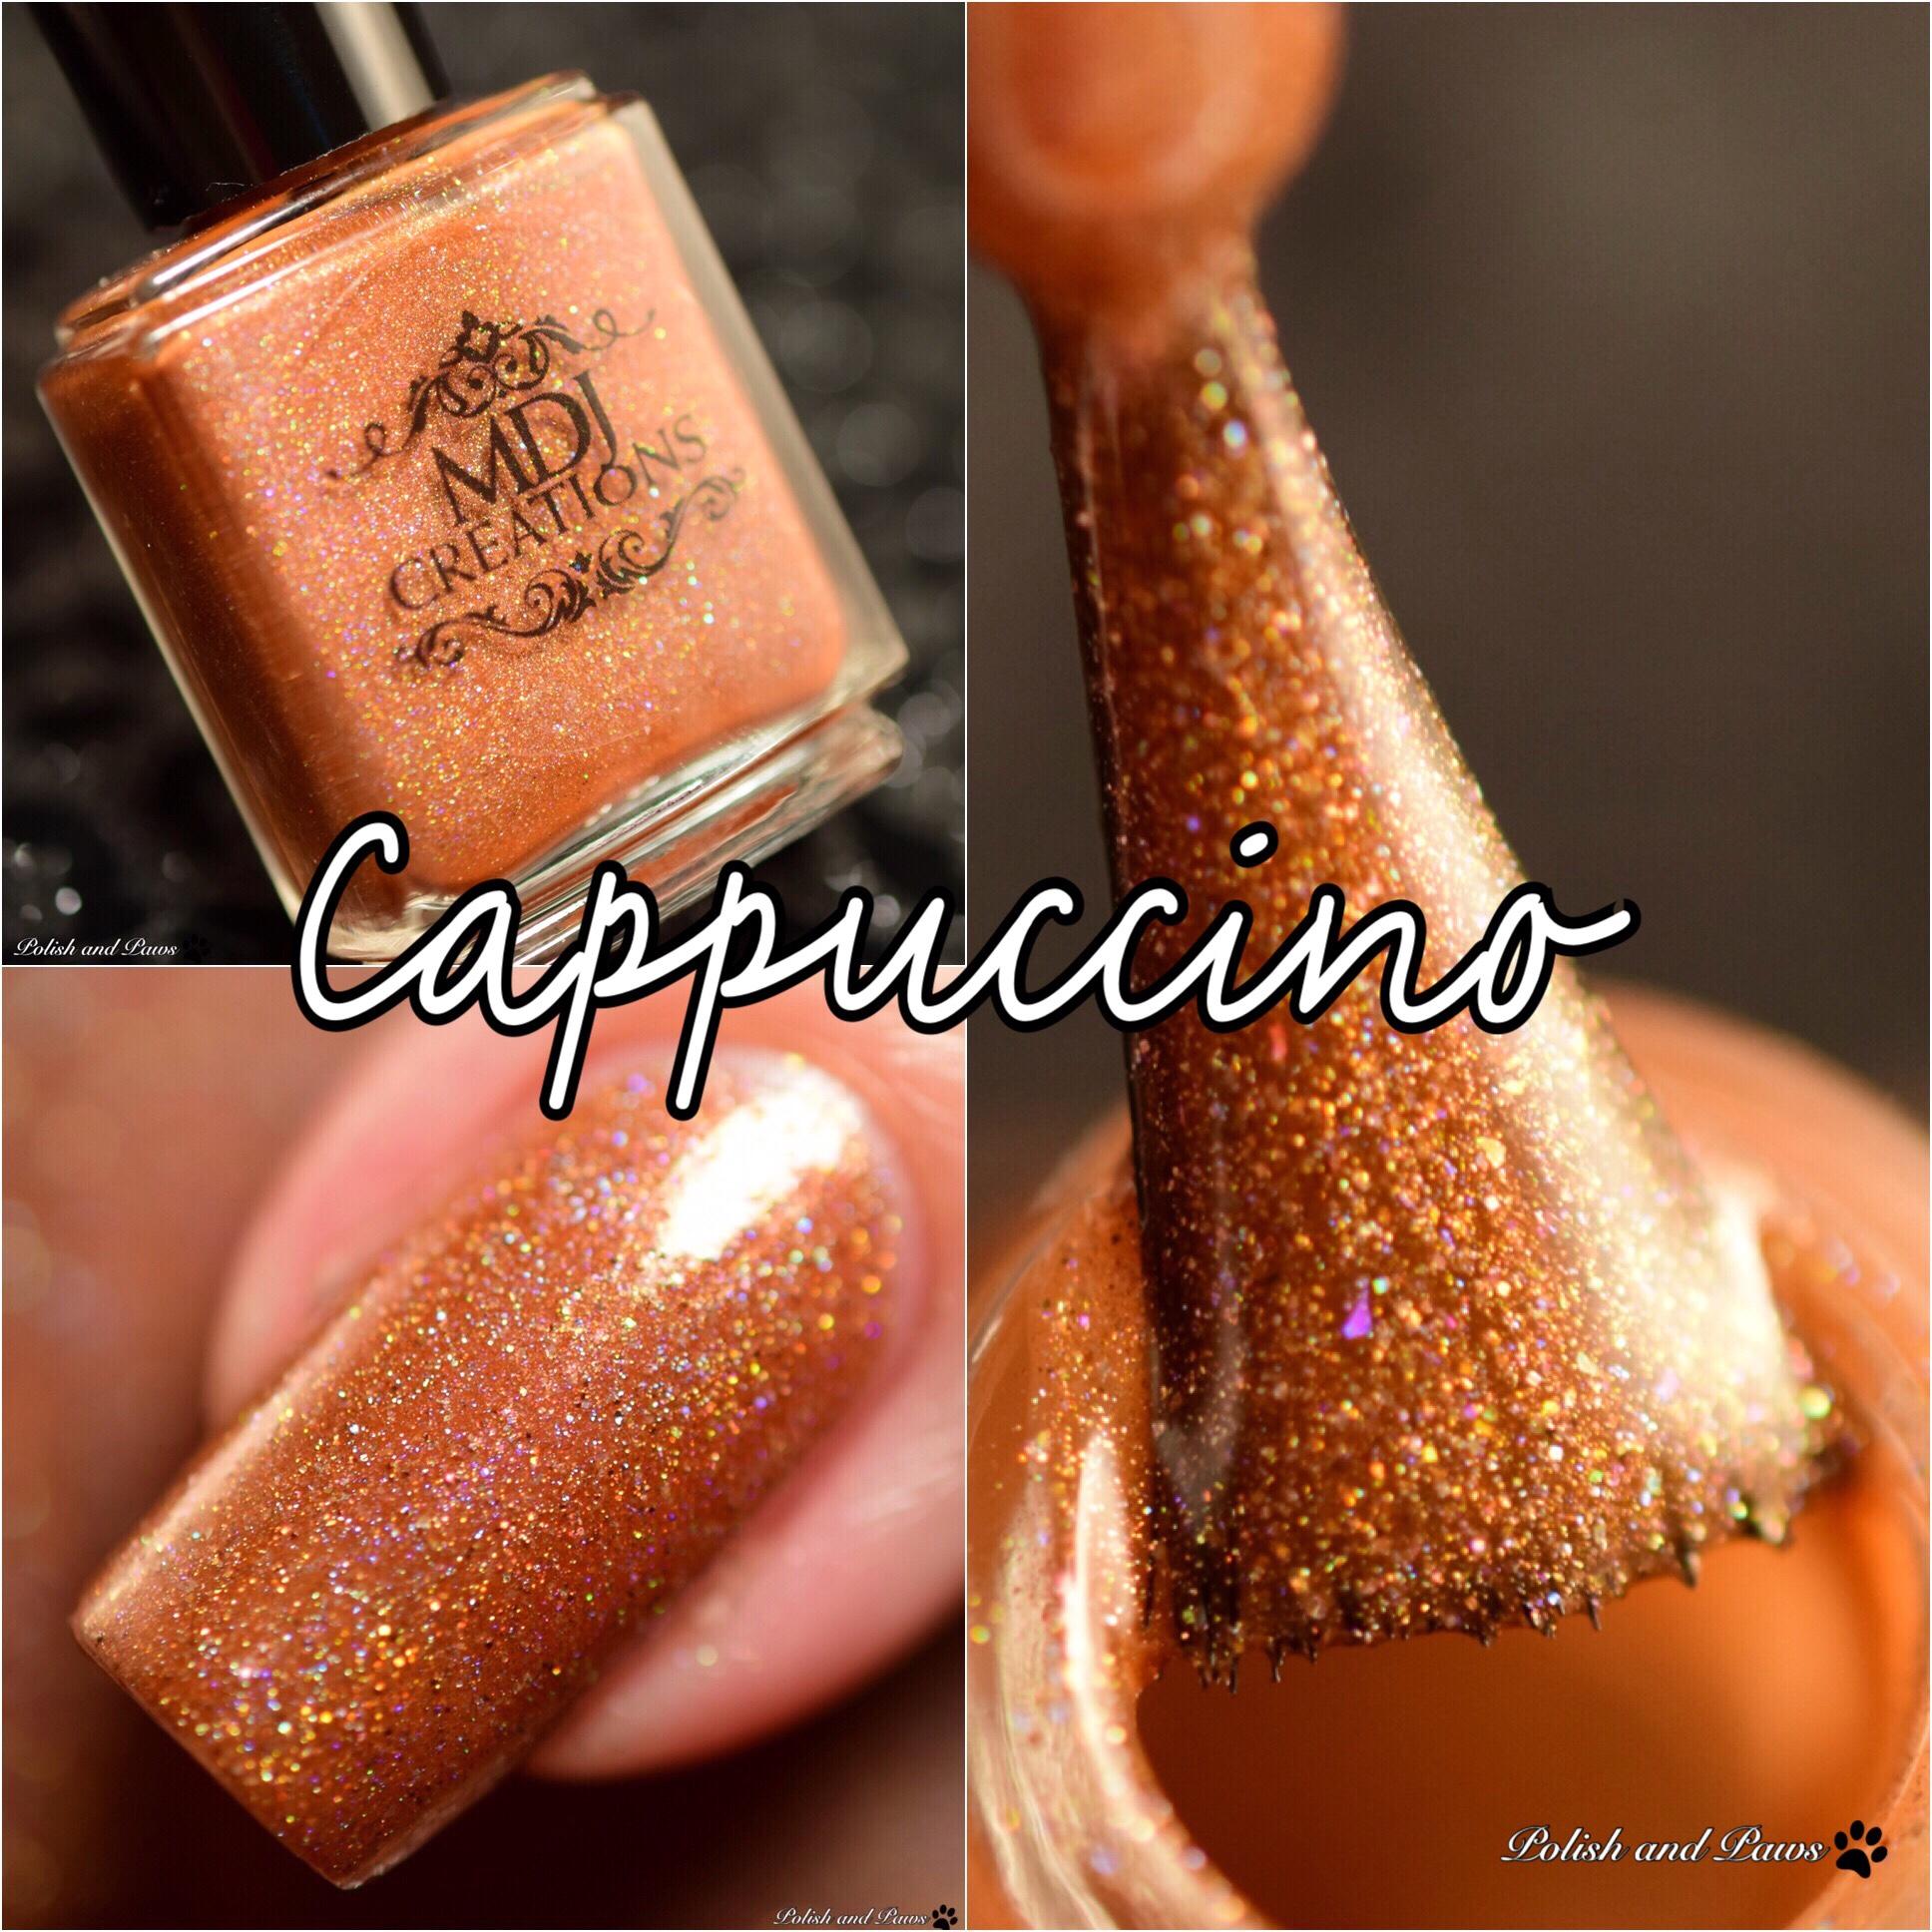 MDJ Creations Cappuccino